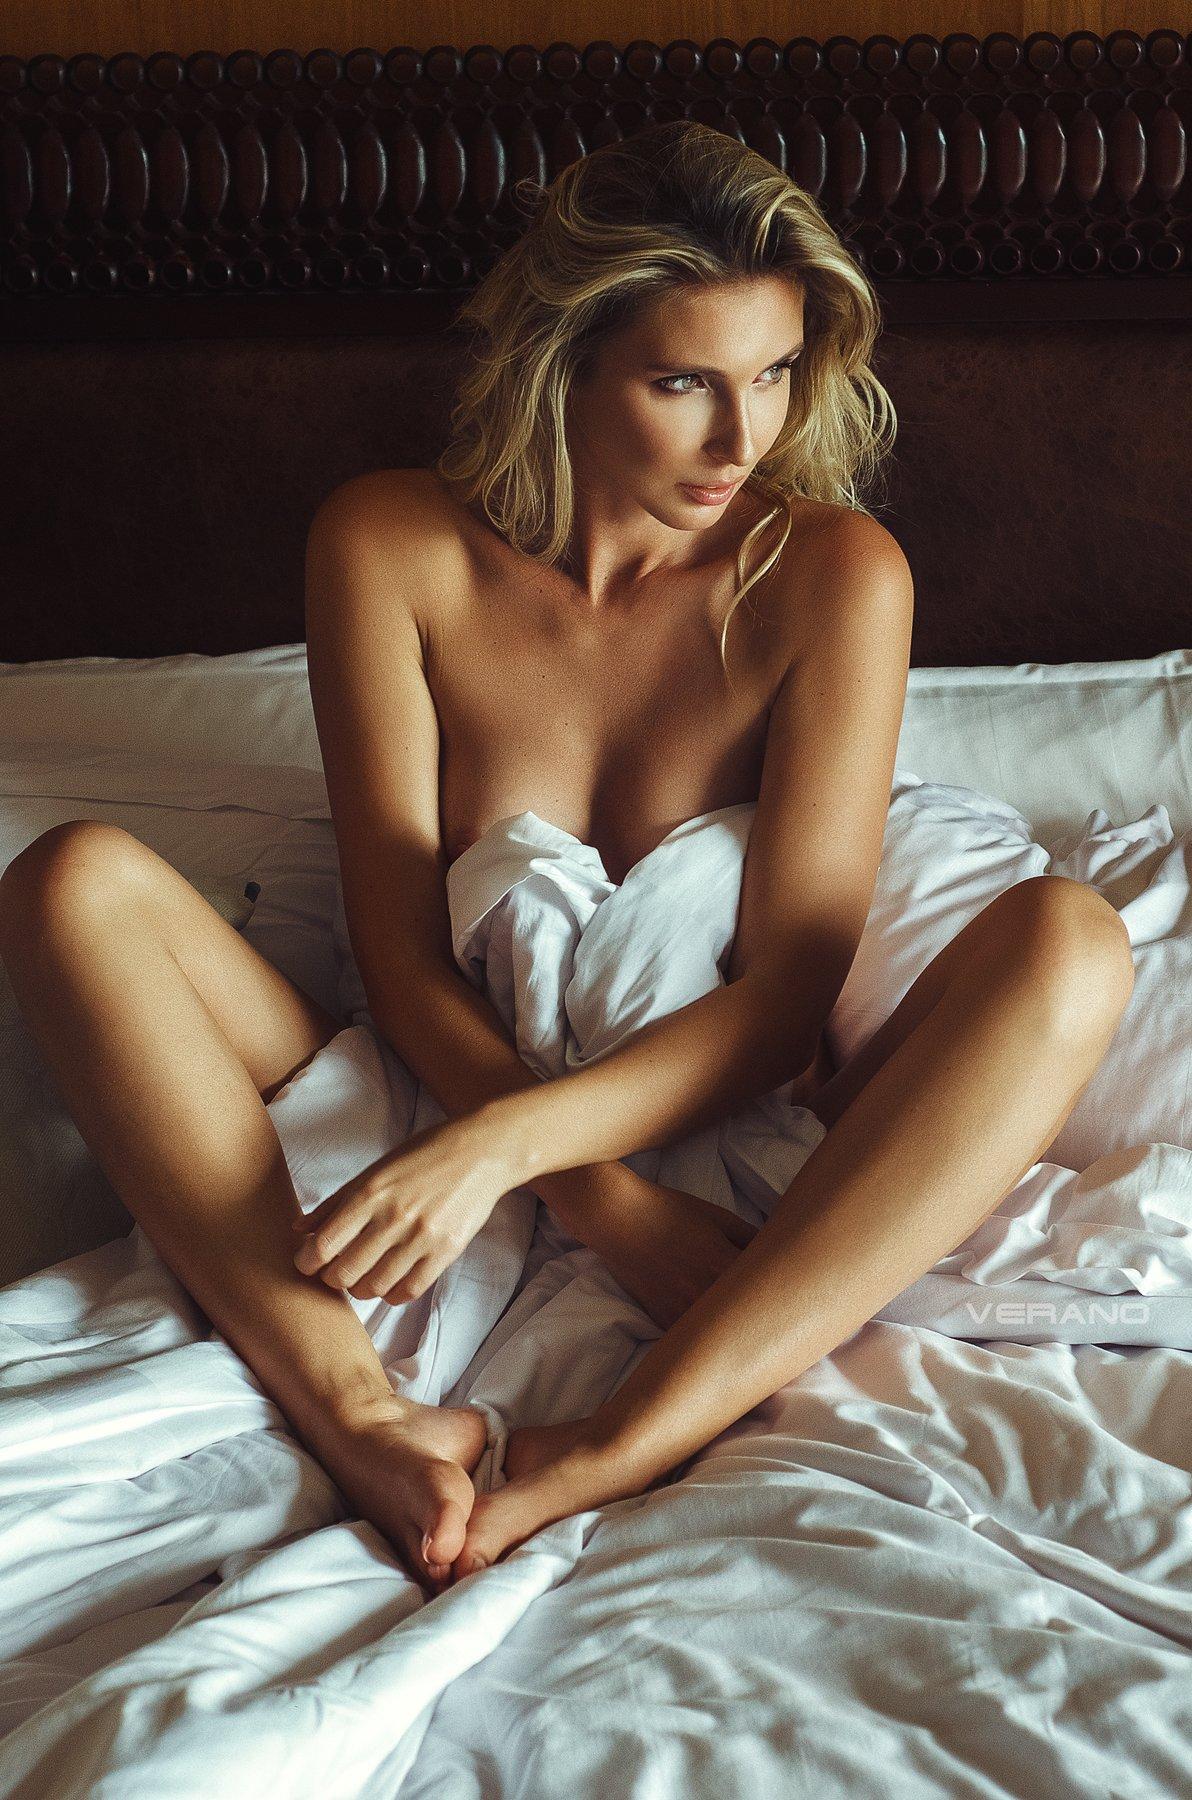 #nikolasverano #verano #model #girl #photographer  #playboy #playboyrussia, Николас Верано